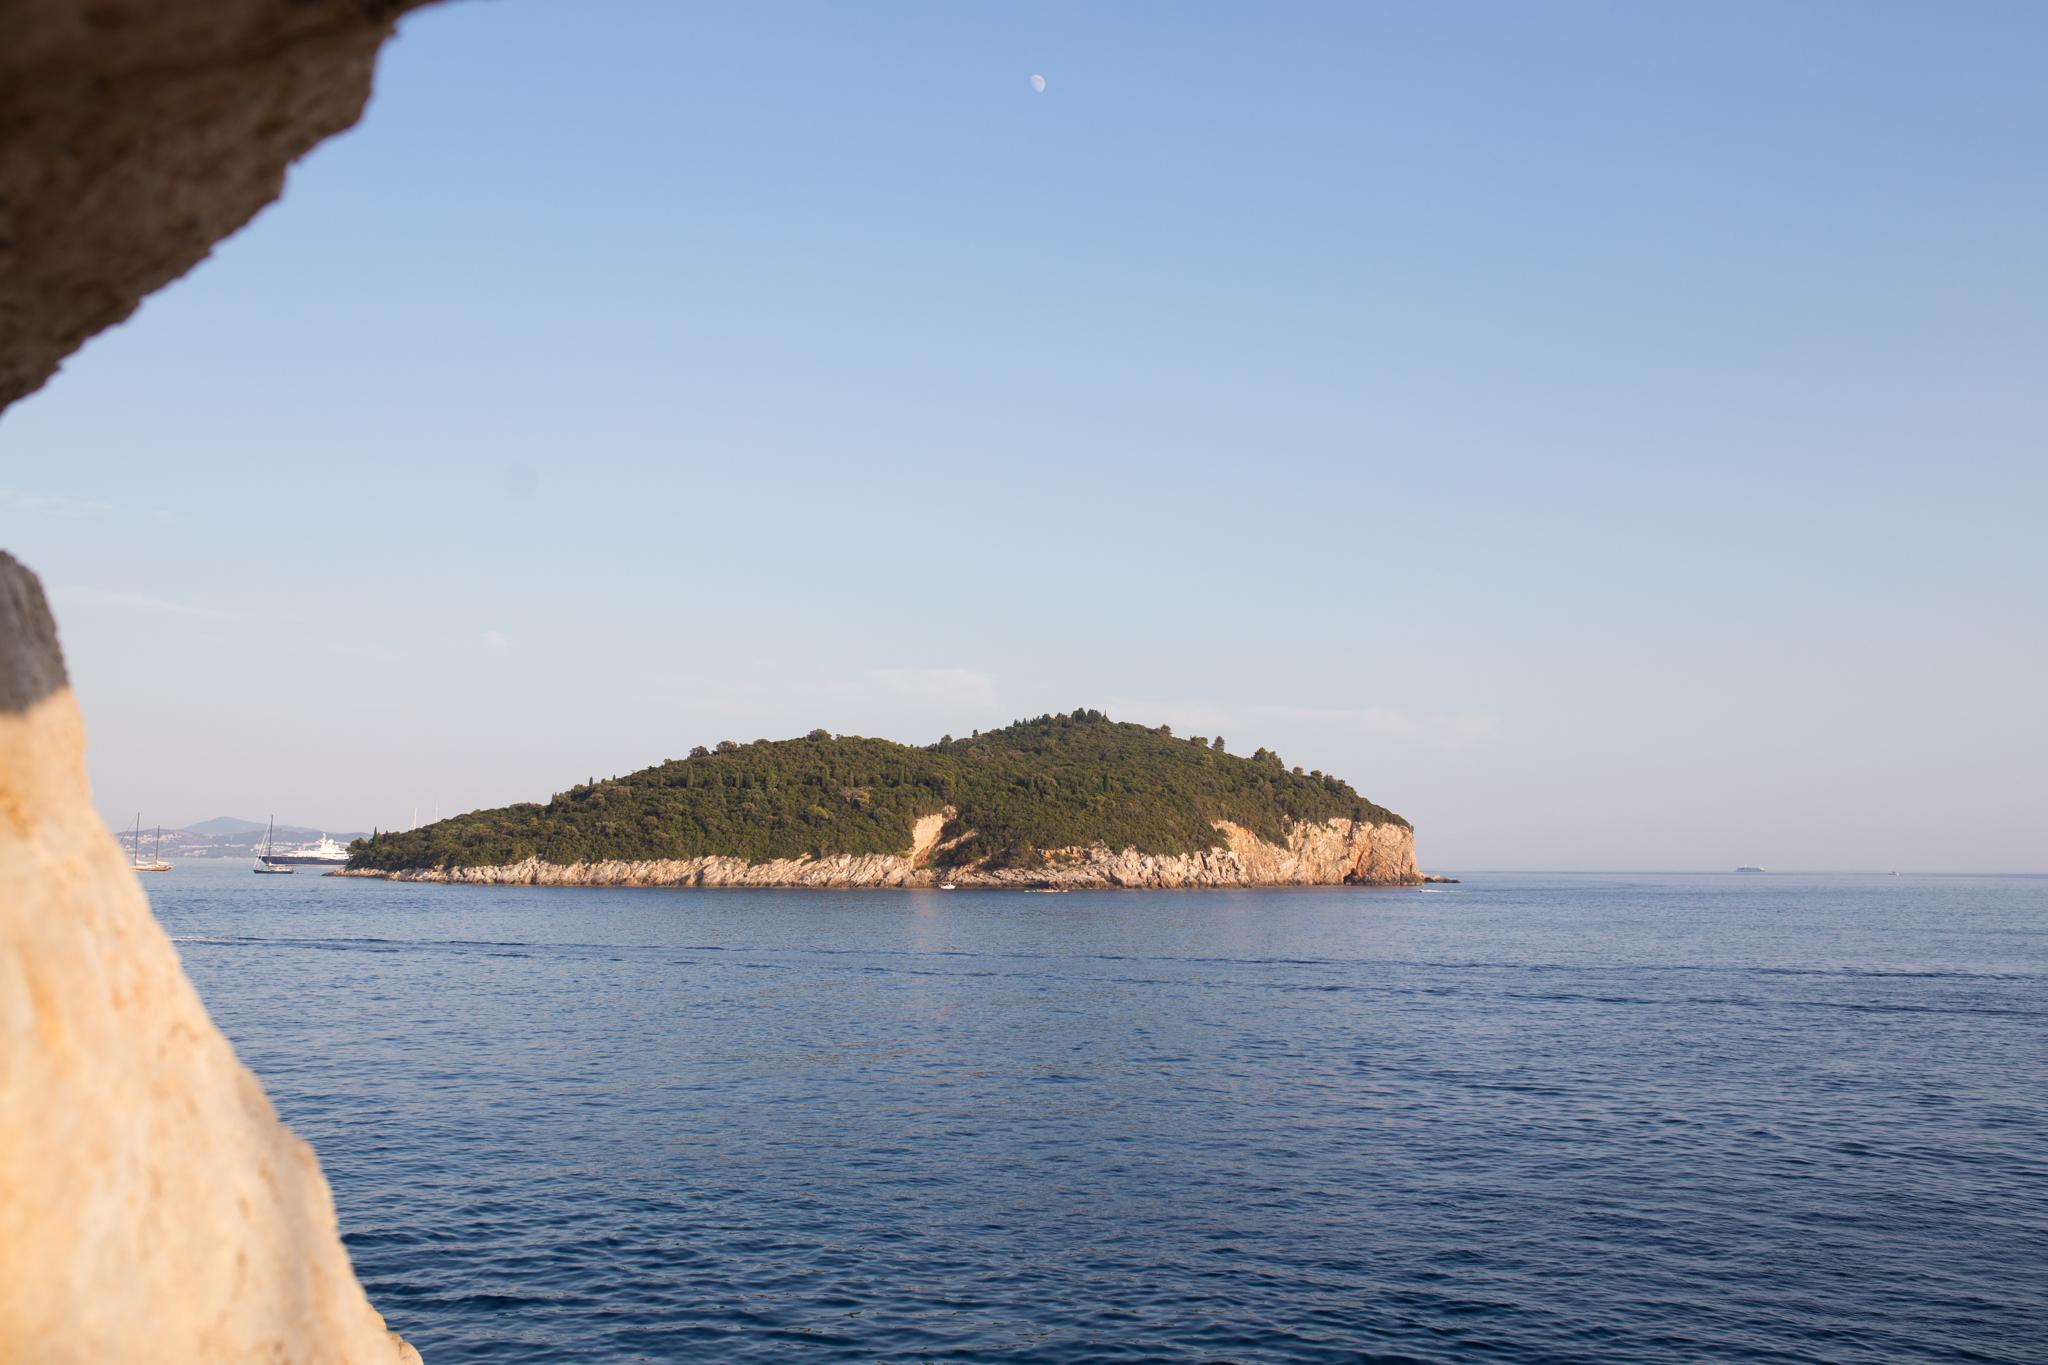 dubrovnik-croatia-dubrovnik hidden spots-dubrovnik beaches-cliff diving in dubrovnik-cliff diving in croatia-arose travels-alina mendoza-9650.jpg